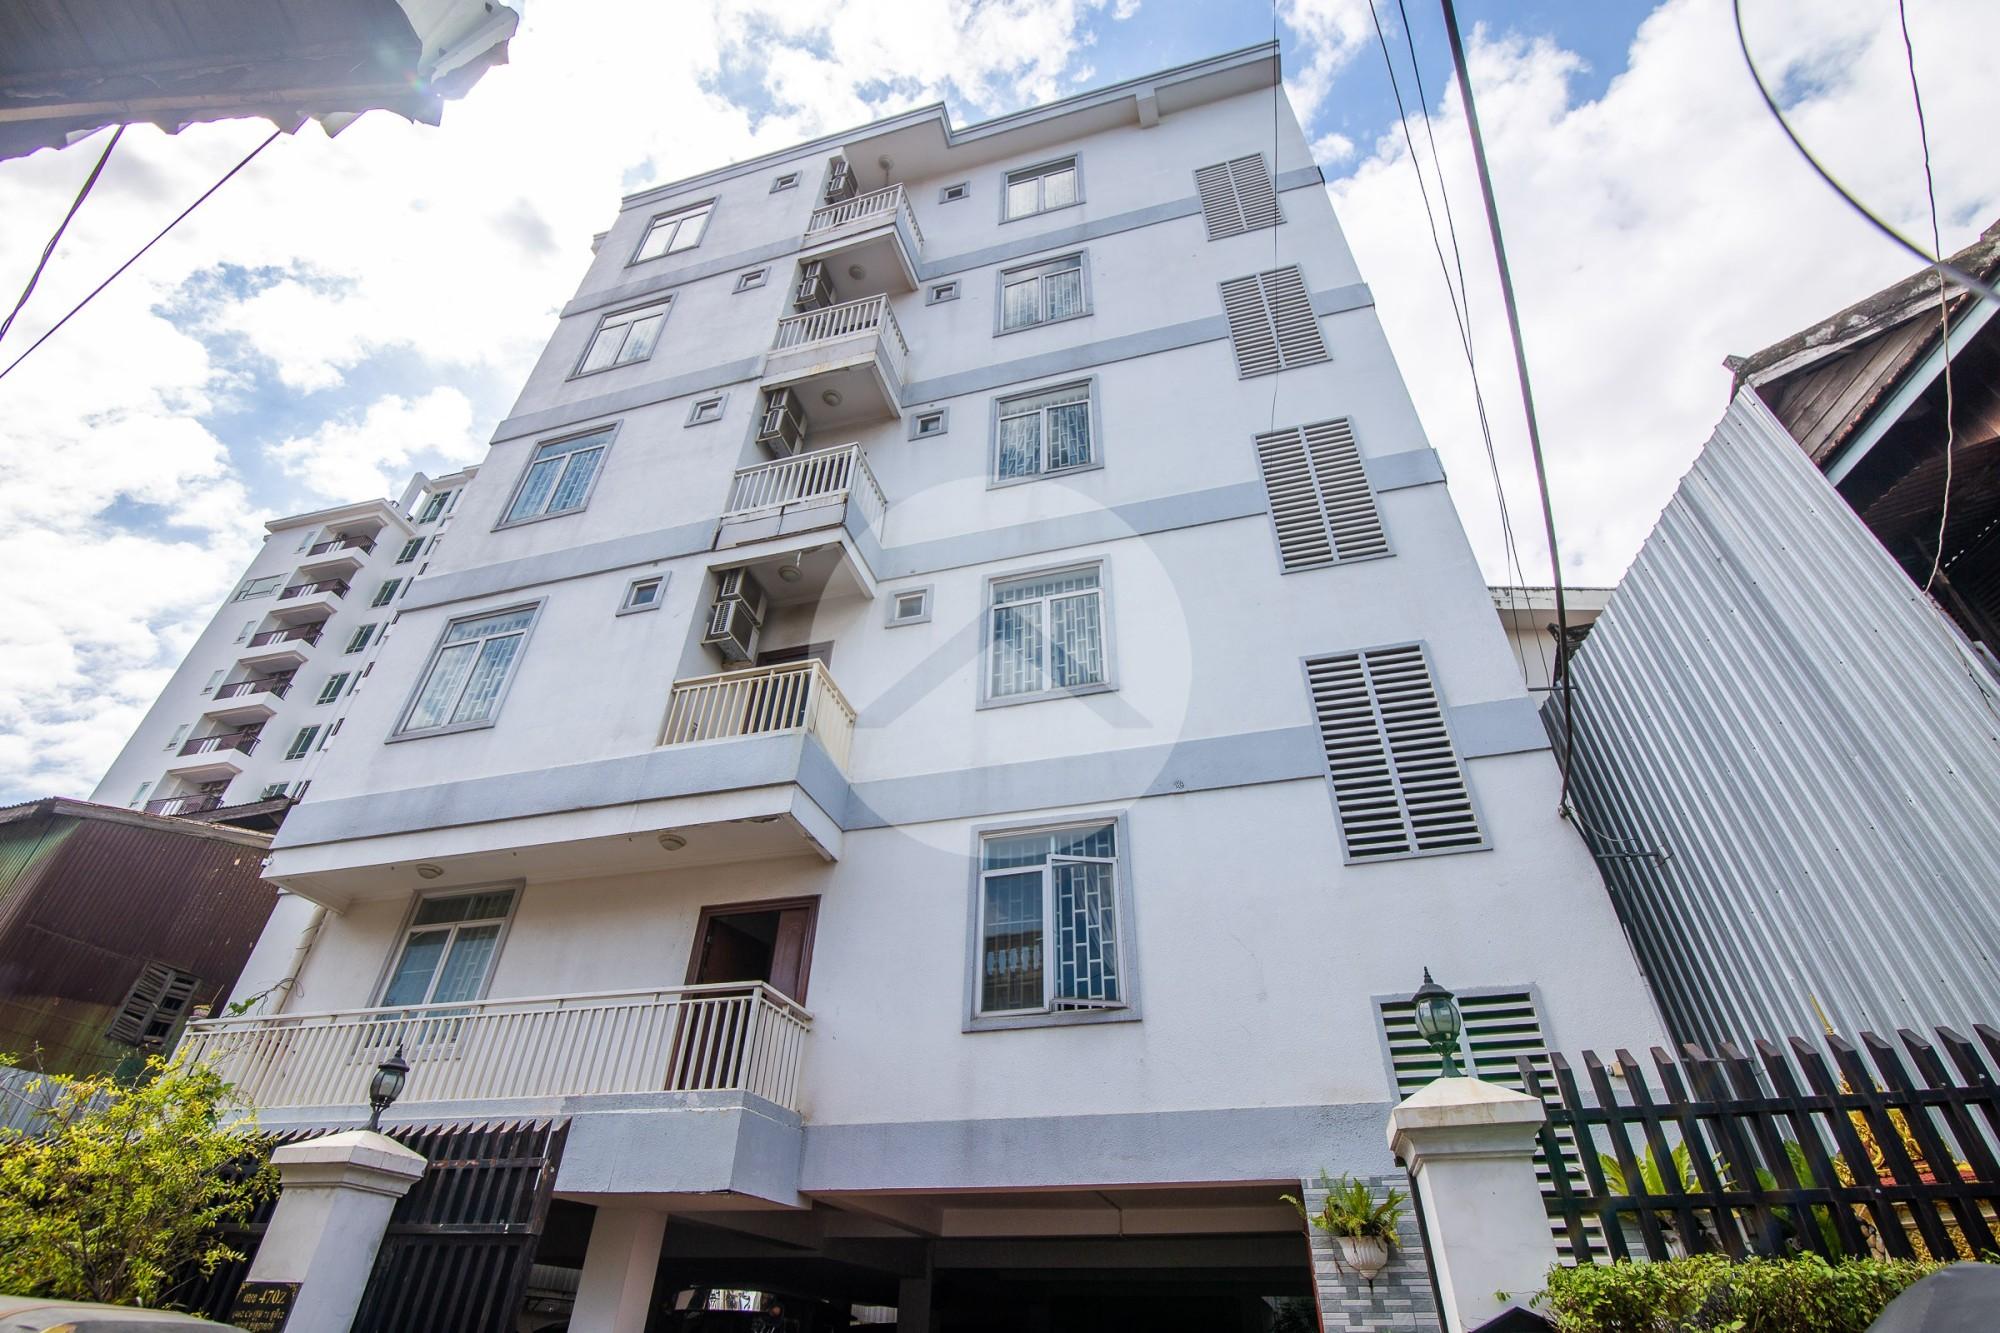 15 Unit Apartment Building For Rent - Tonle Bassac, Phnom Penh